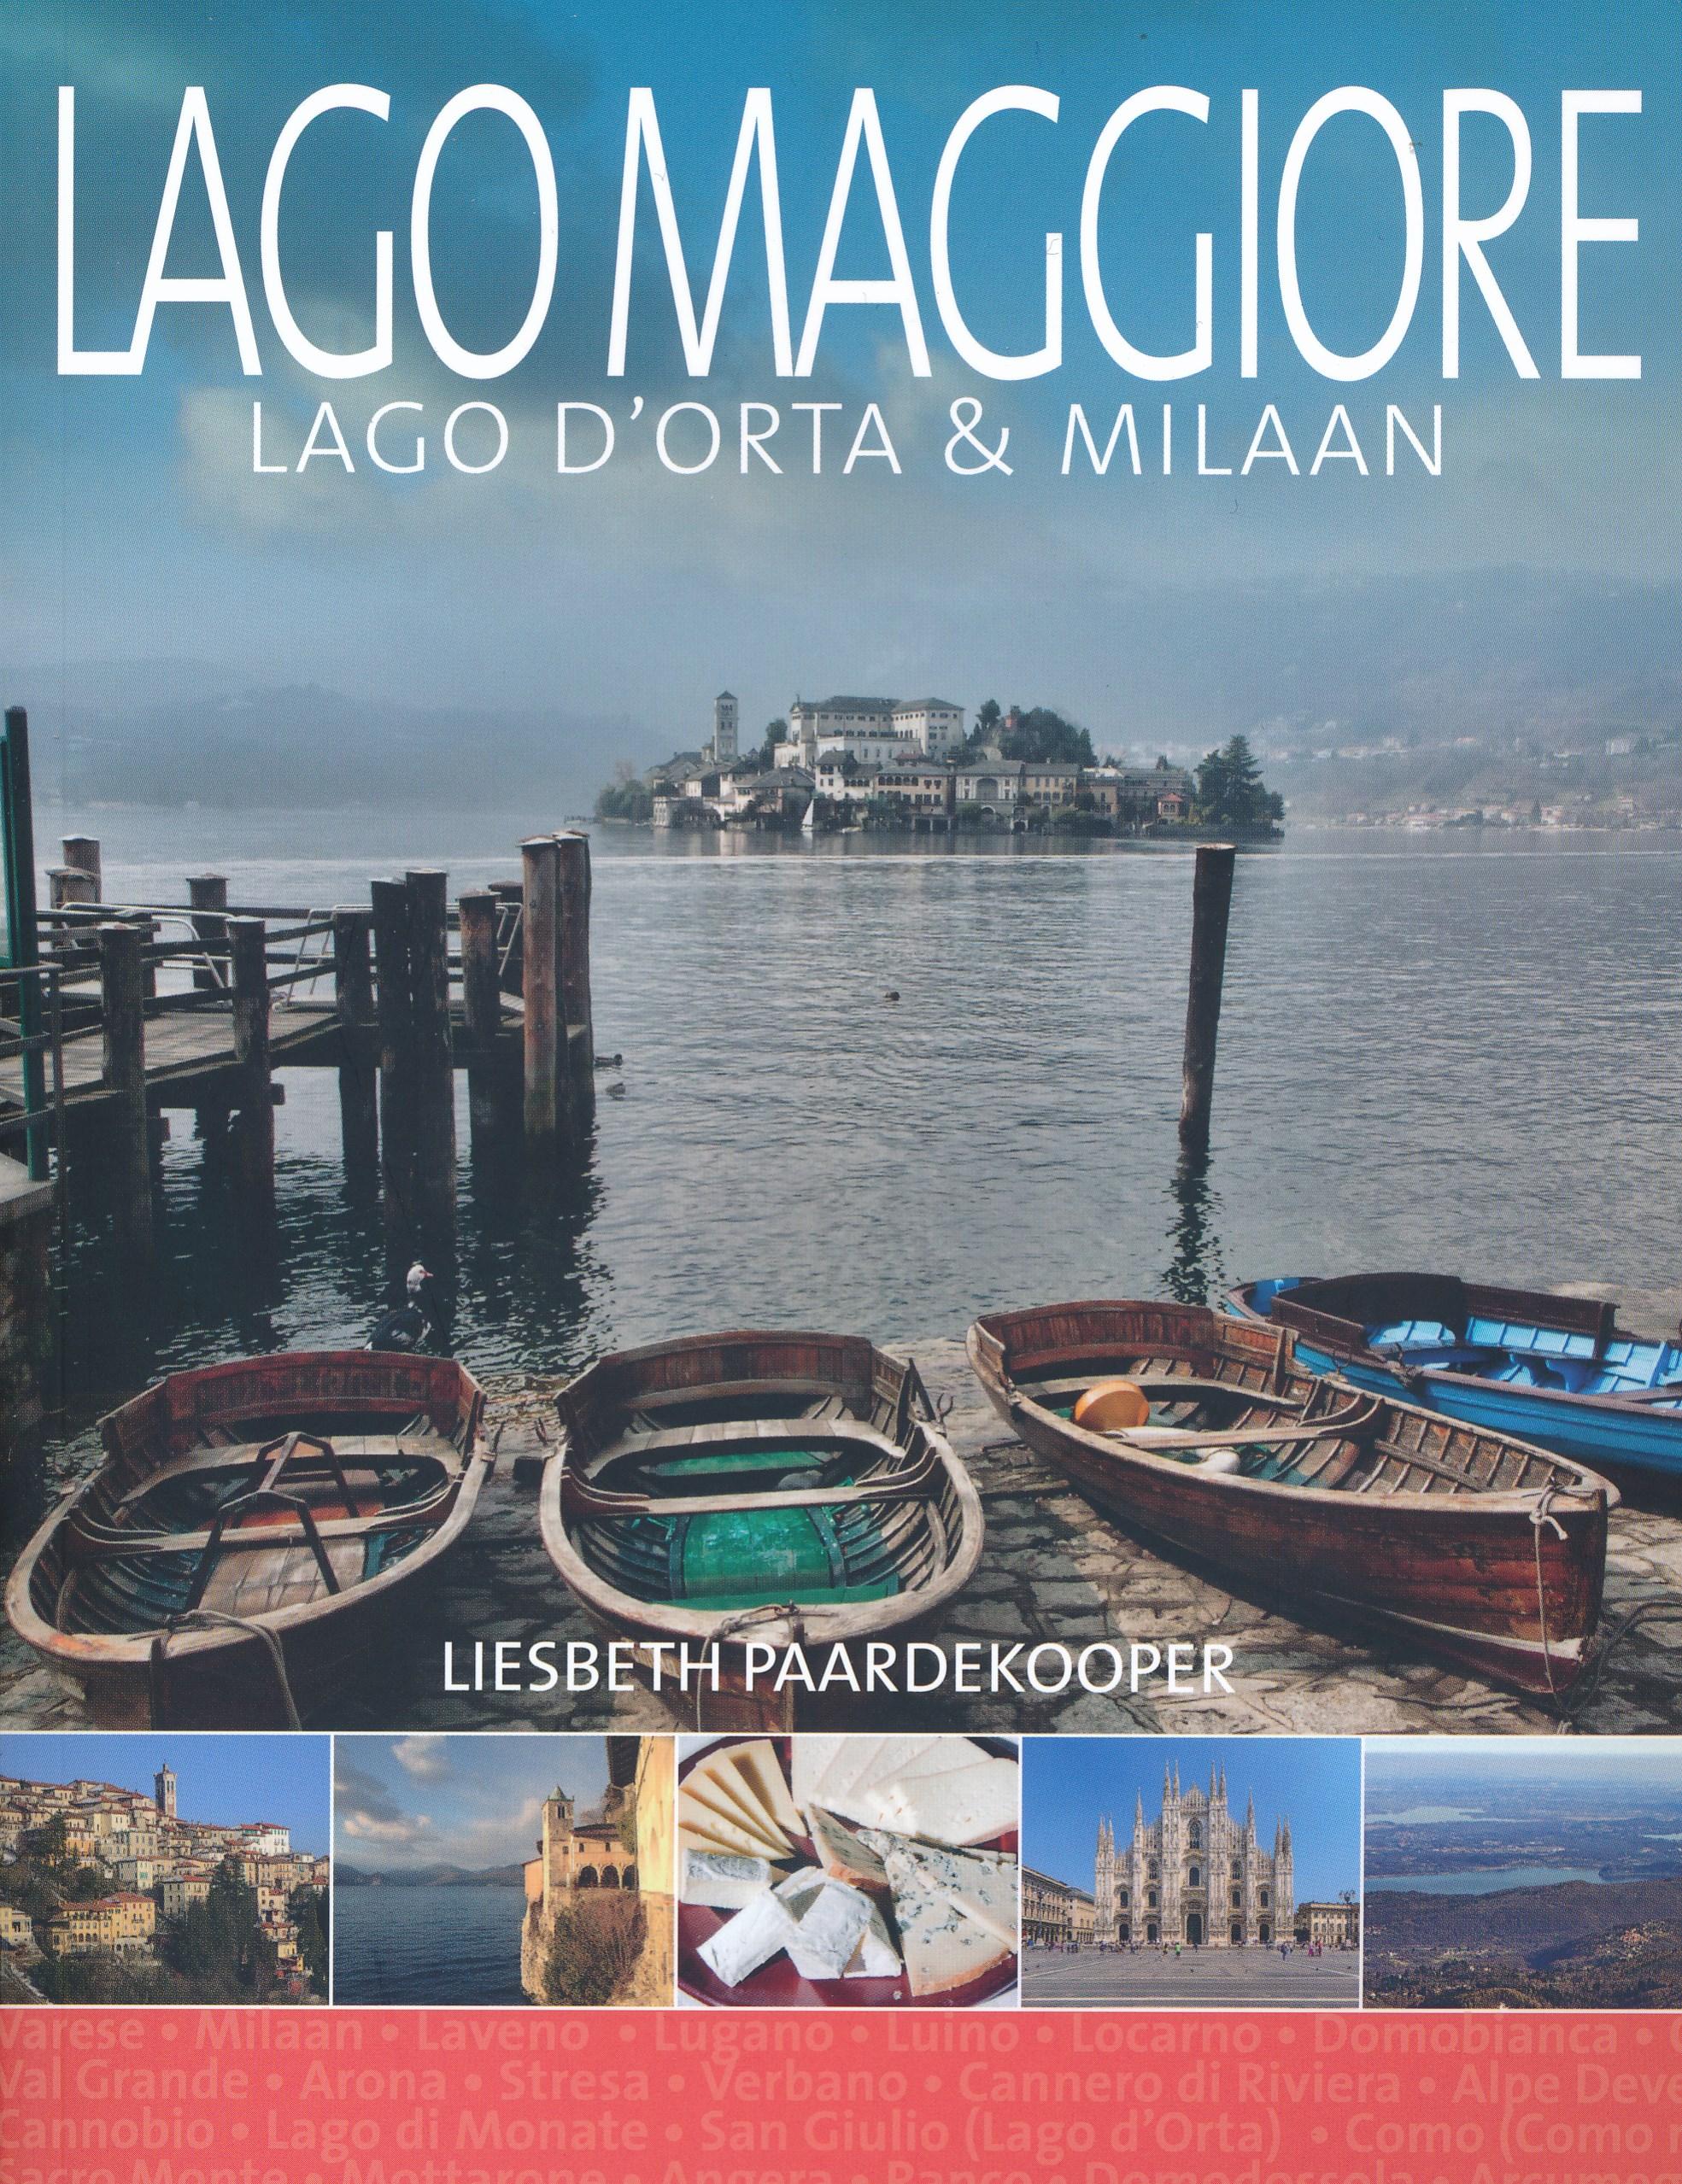 Reisgids Lago Maggiore | Edicola | €22,50